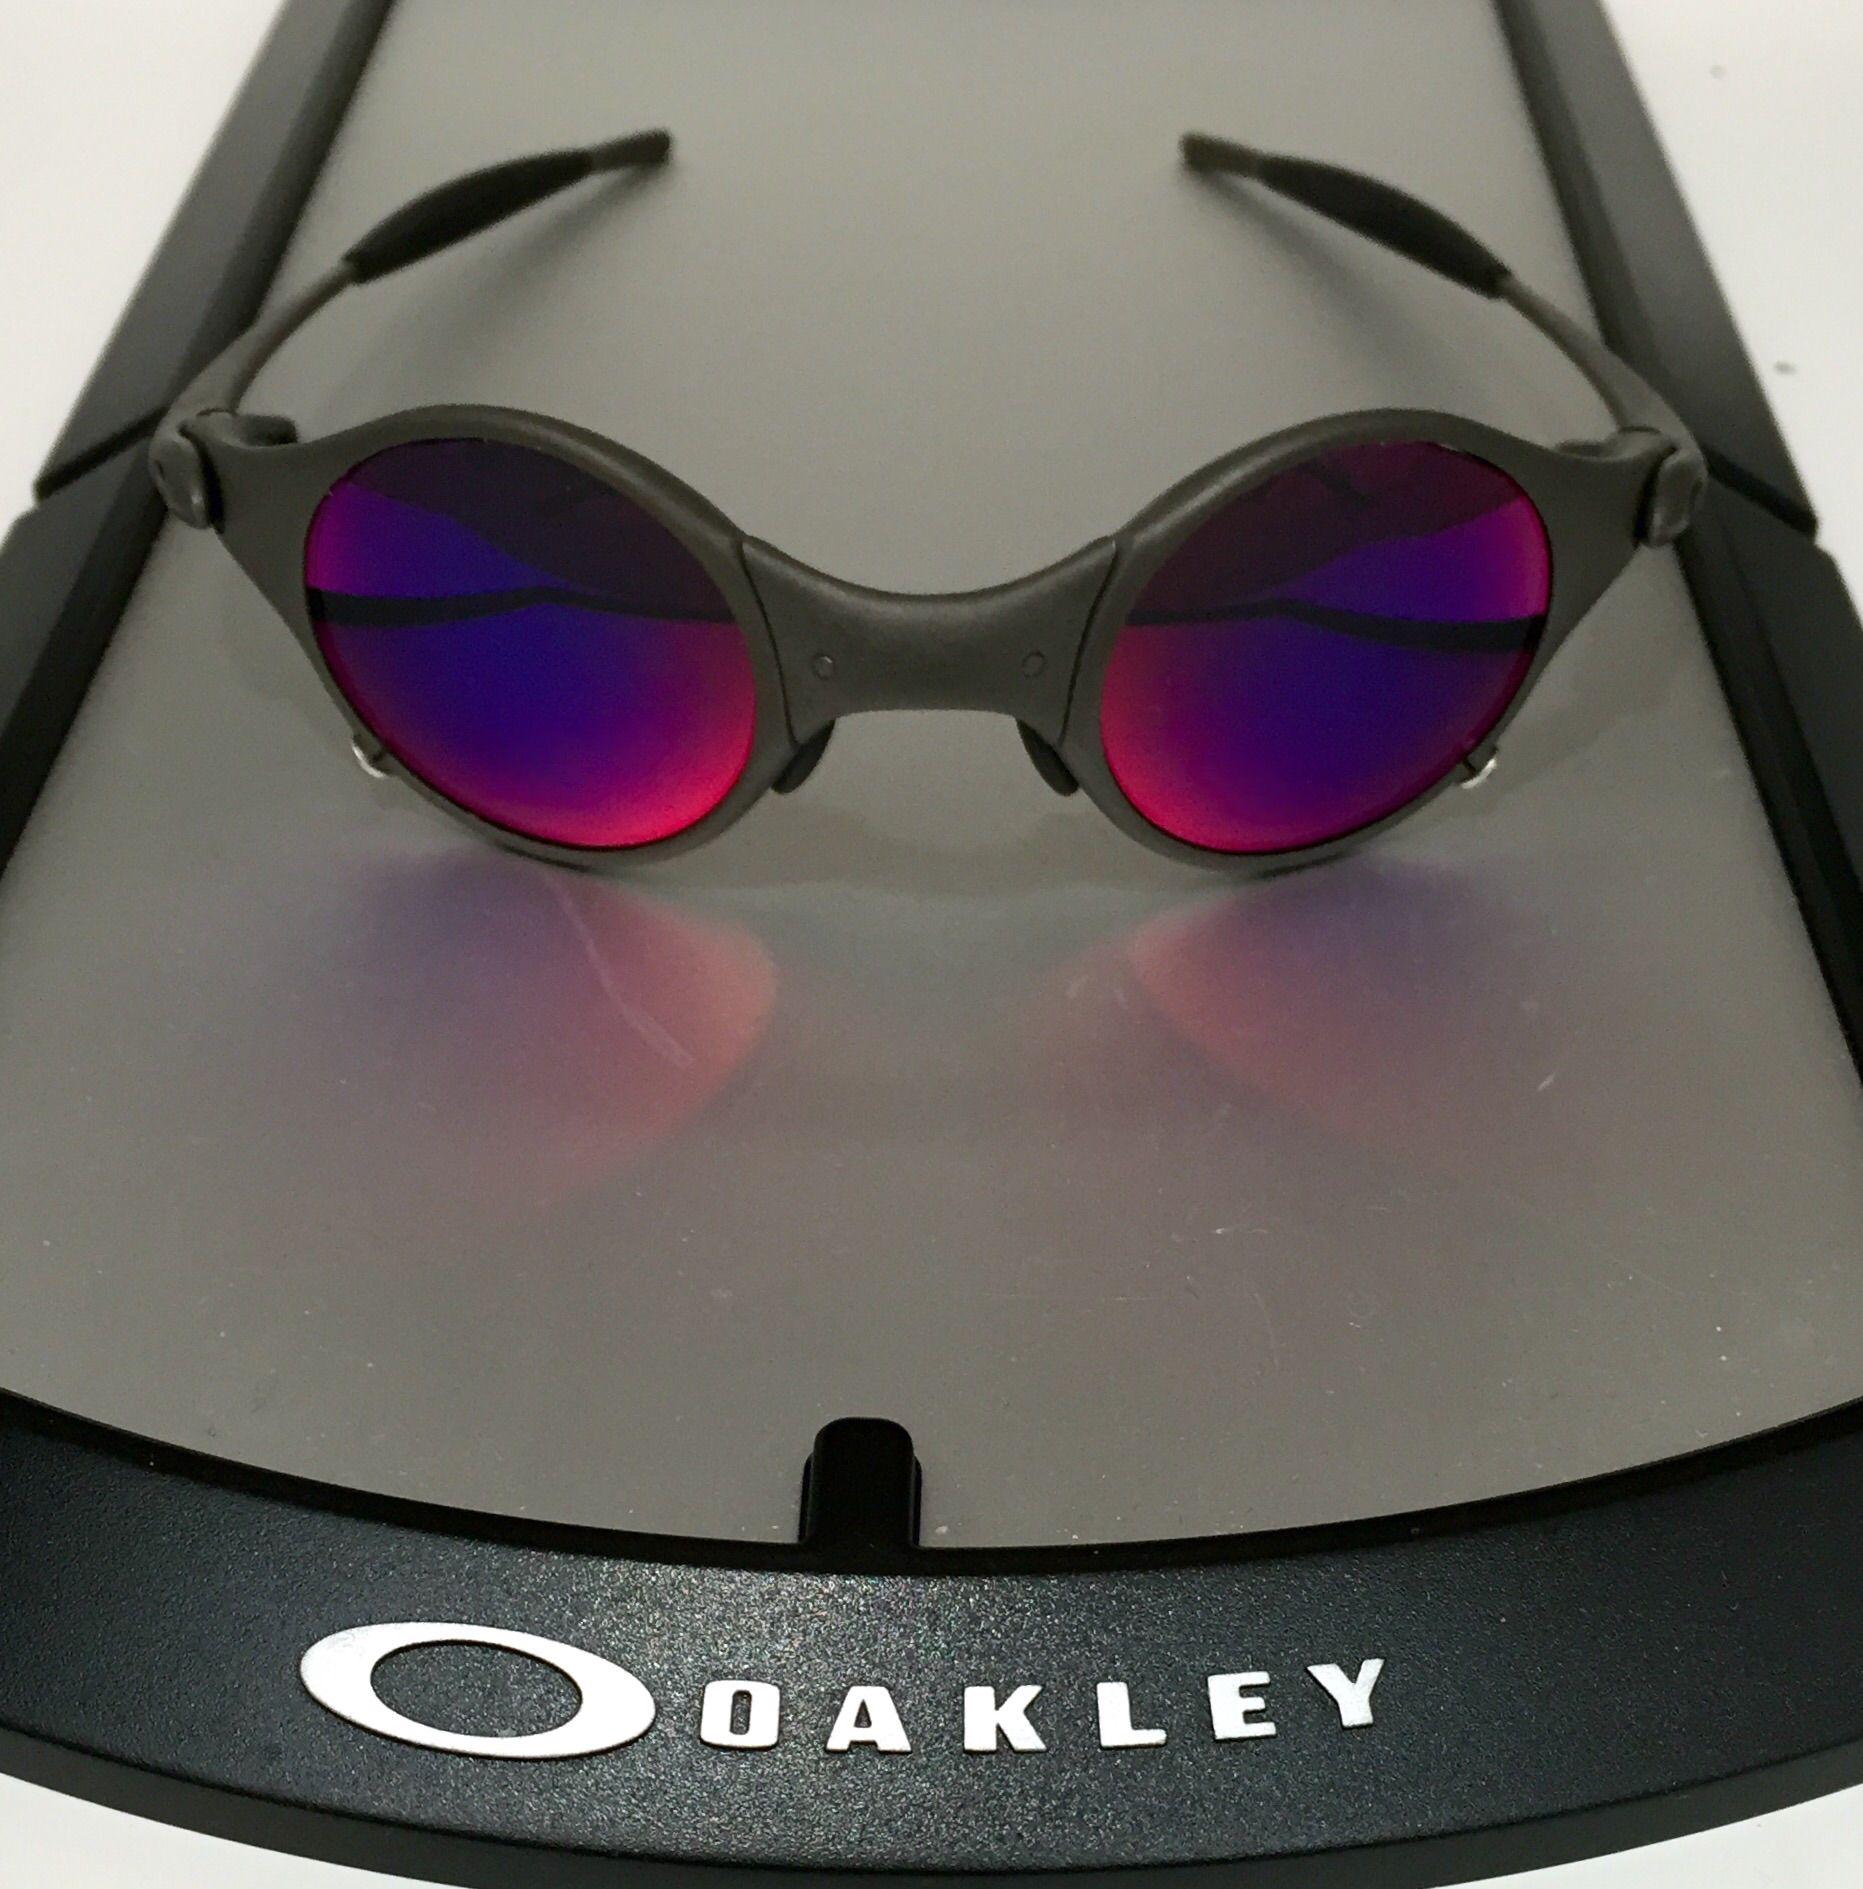 0d8ade2d92980 Roupas Masculinas, Telefone, Óculos De Sol Da Oakley, Metais, Bling Bling,